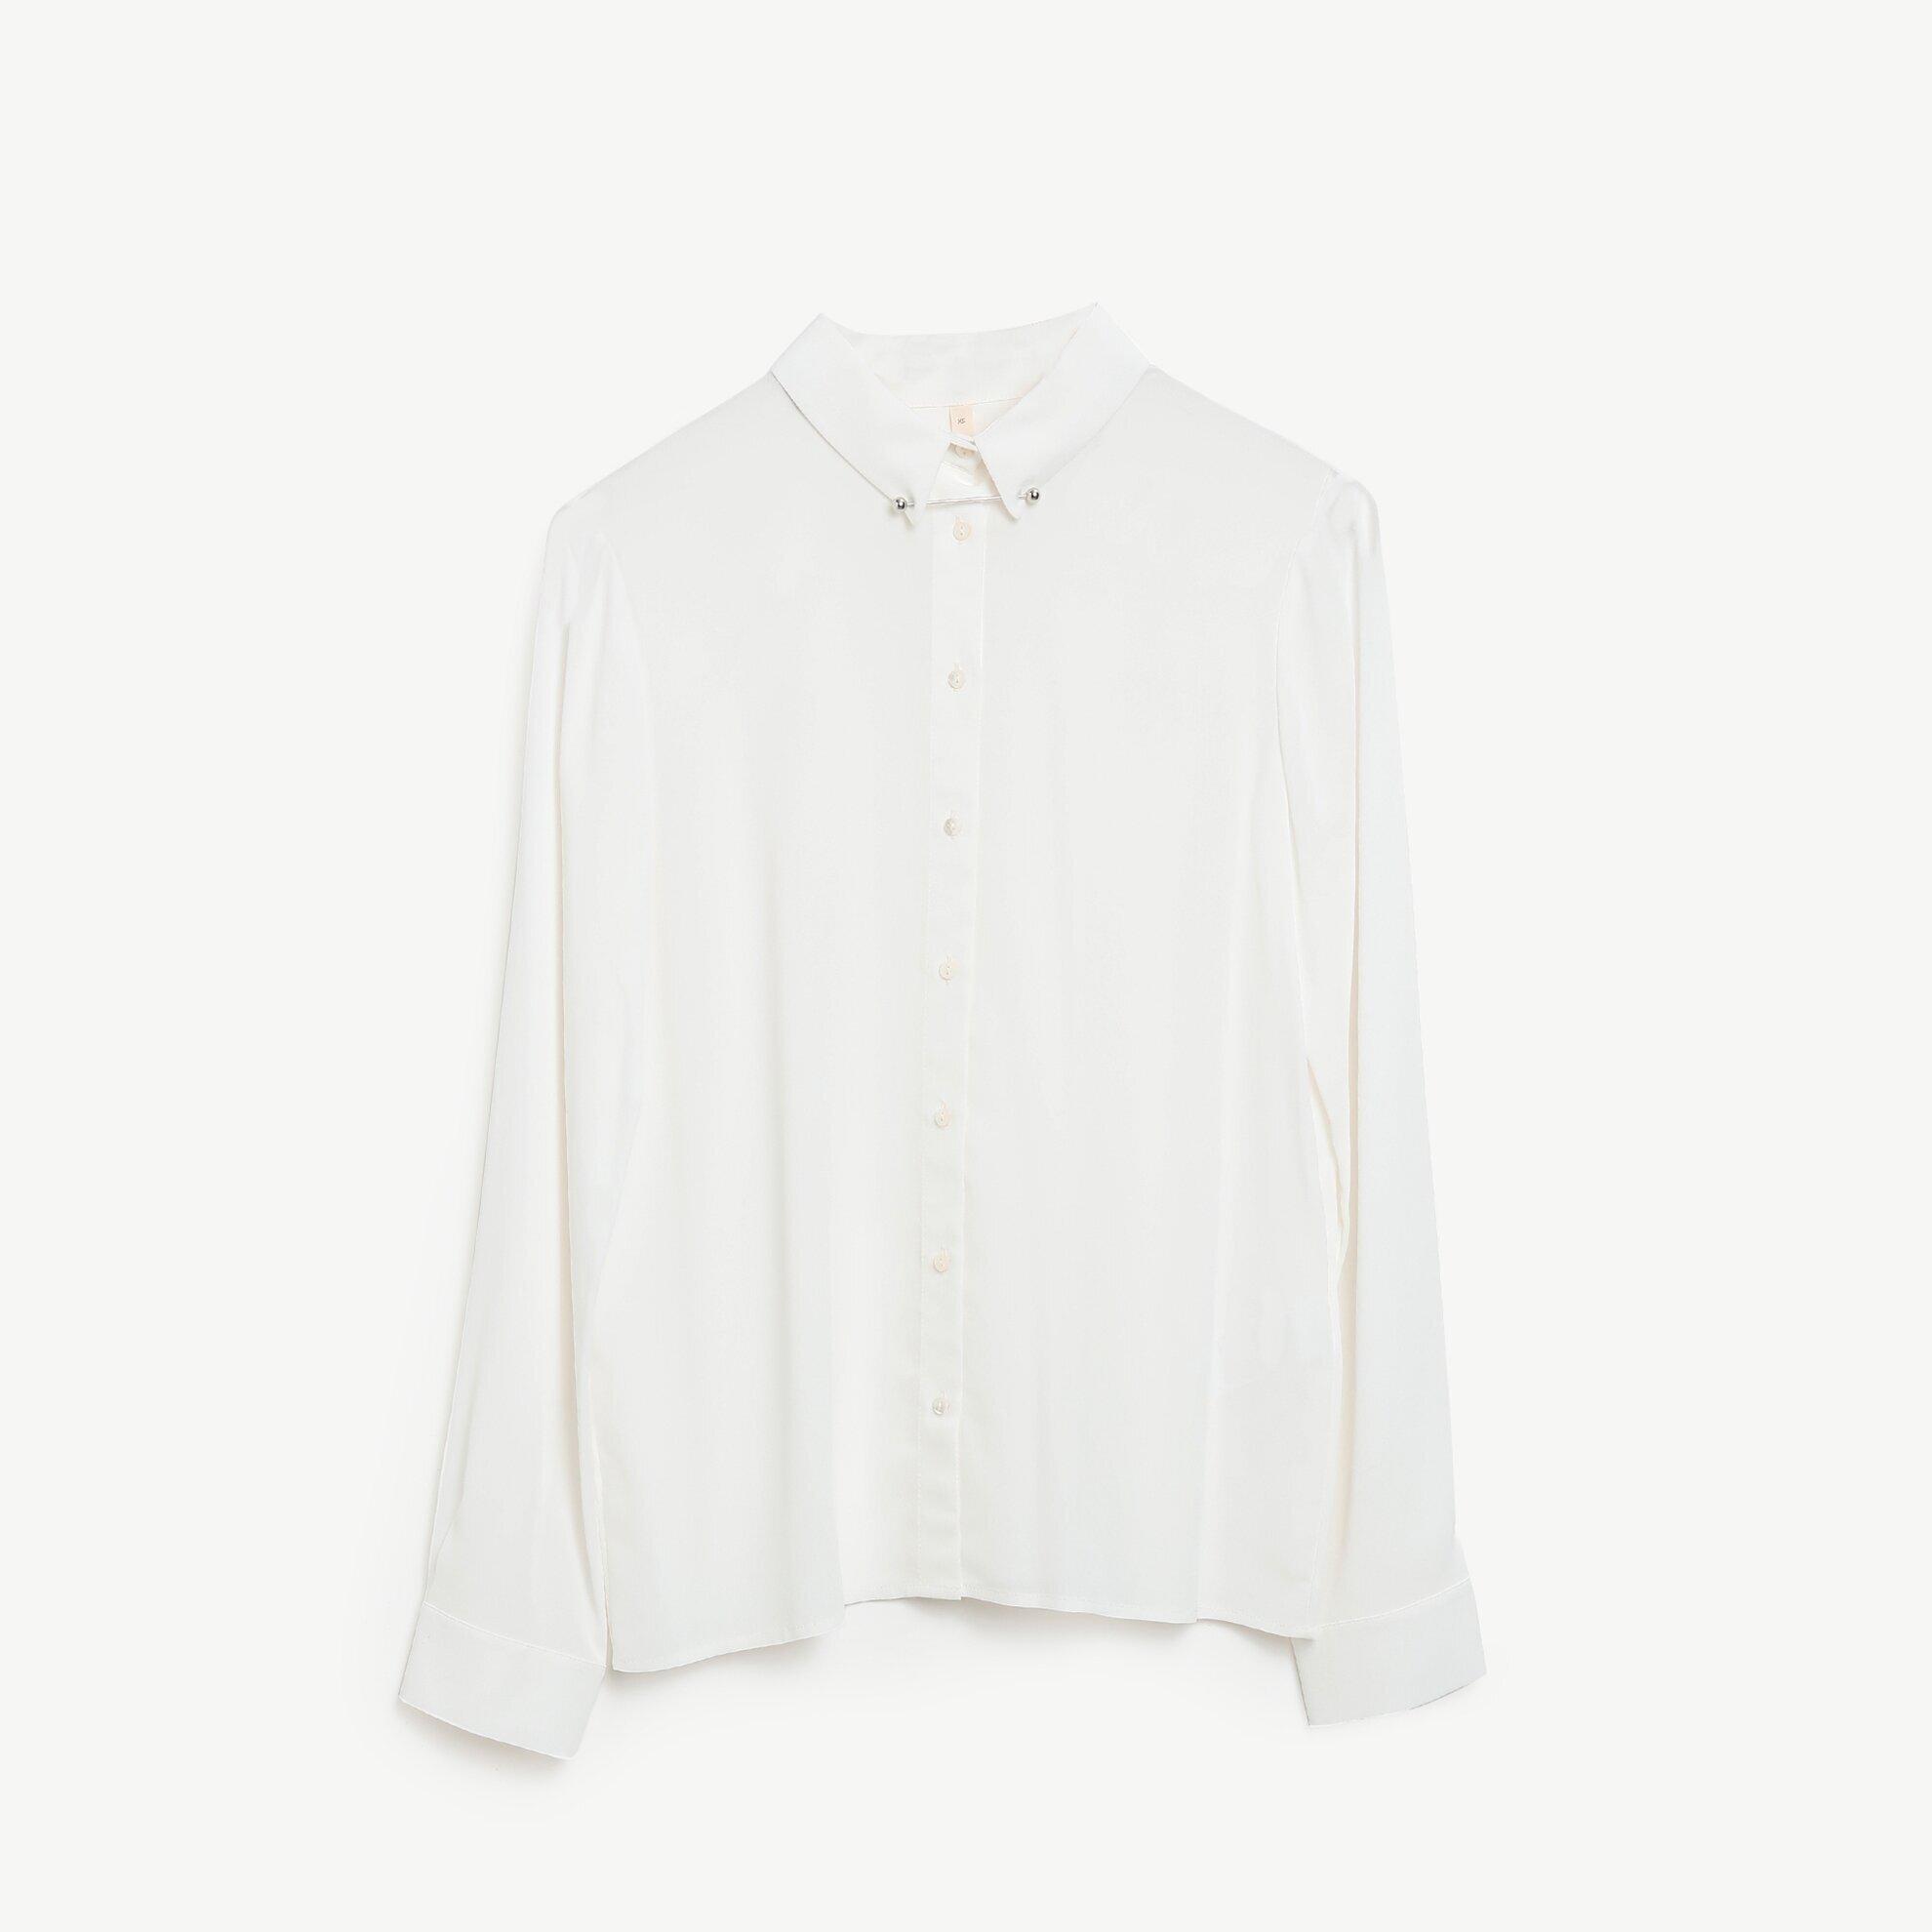 Collar Pin Detailed Shirt